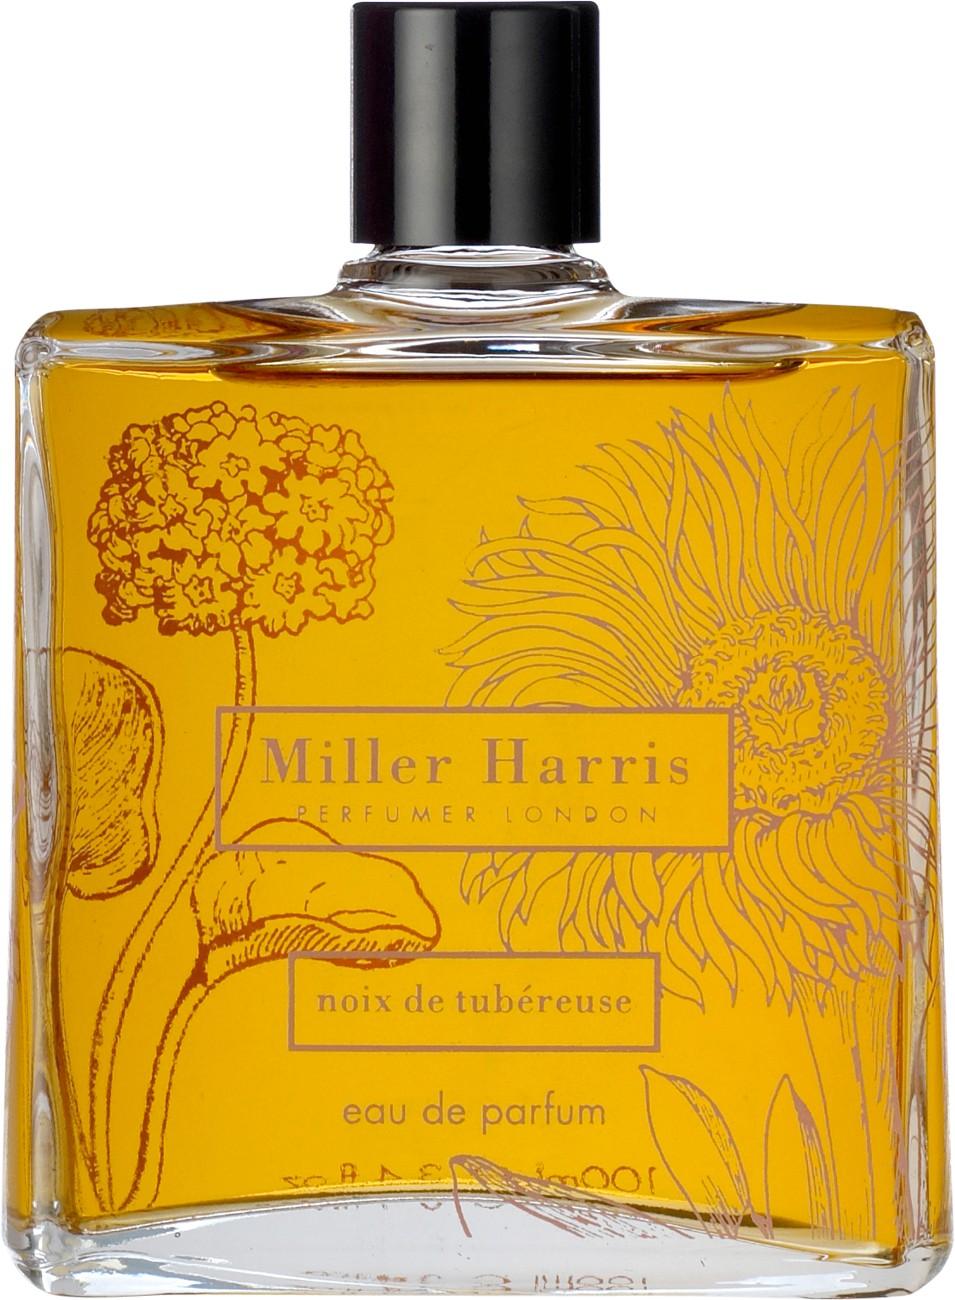 Miller Harris Noix De Tubéreuse аромат для мужчин и женщин